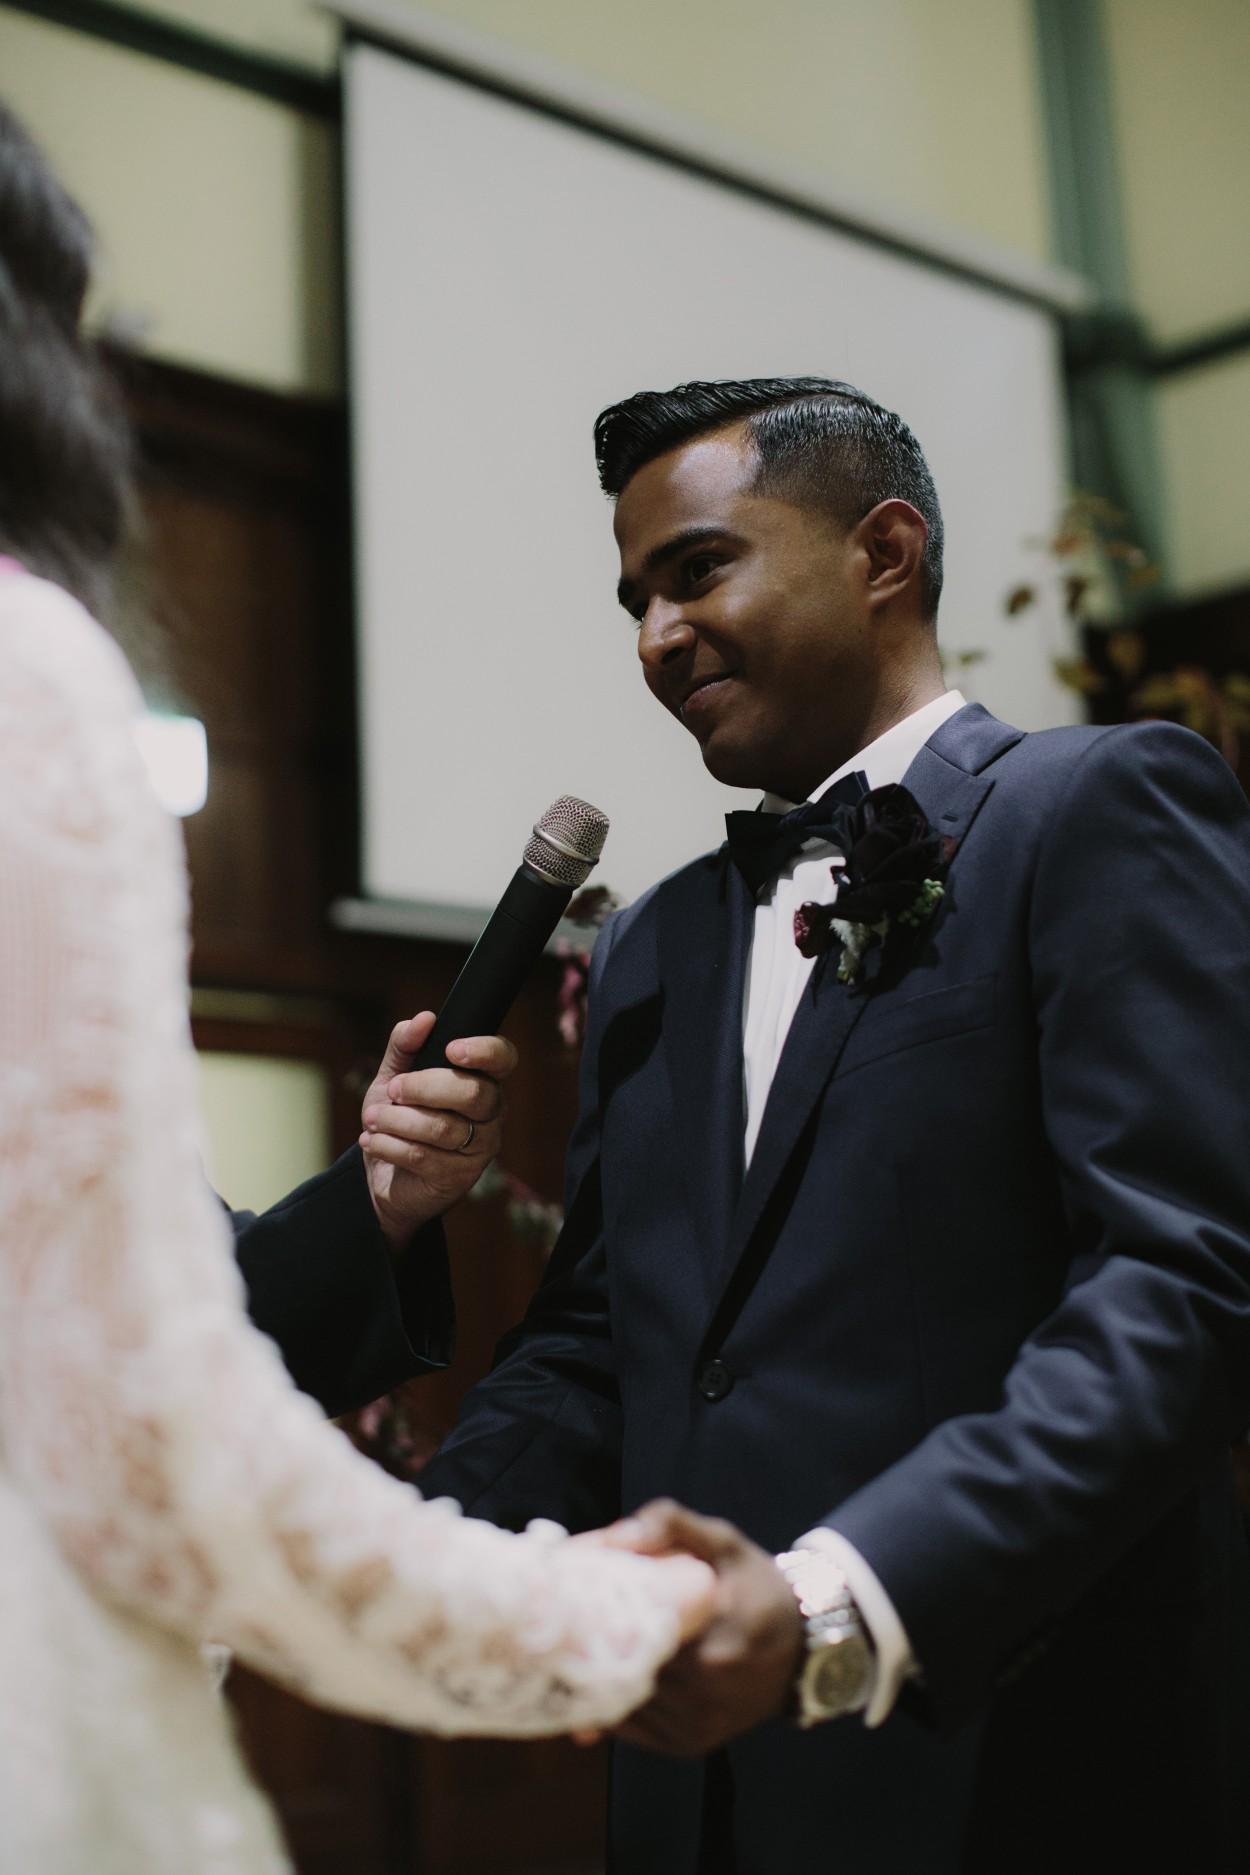 I-Got-You-Babe-Weddings-The-033George-Ballroom-St-Kilda-Wedding-Amy-Abhi.jpg